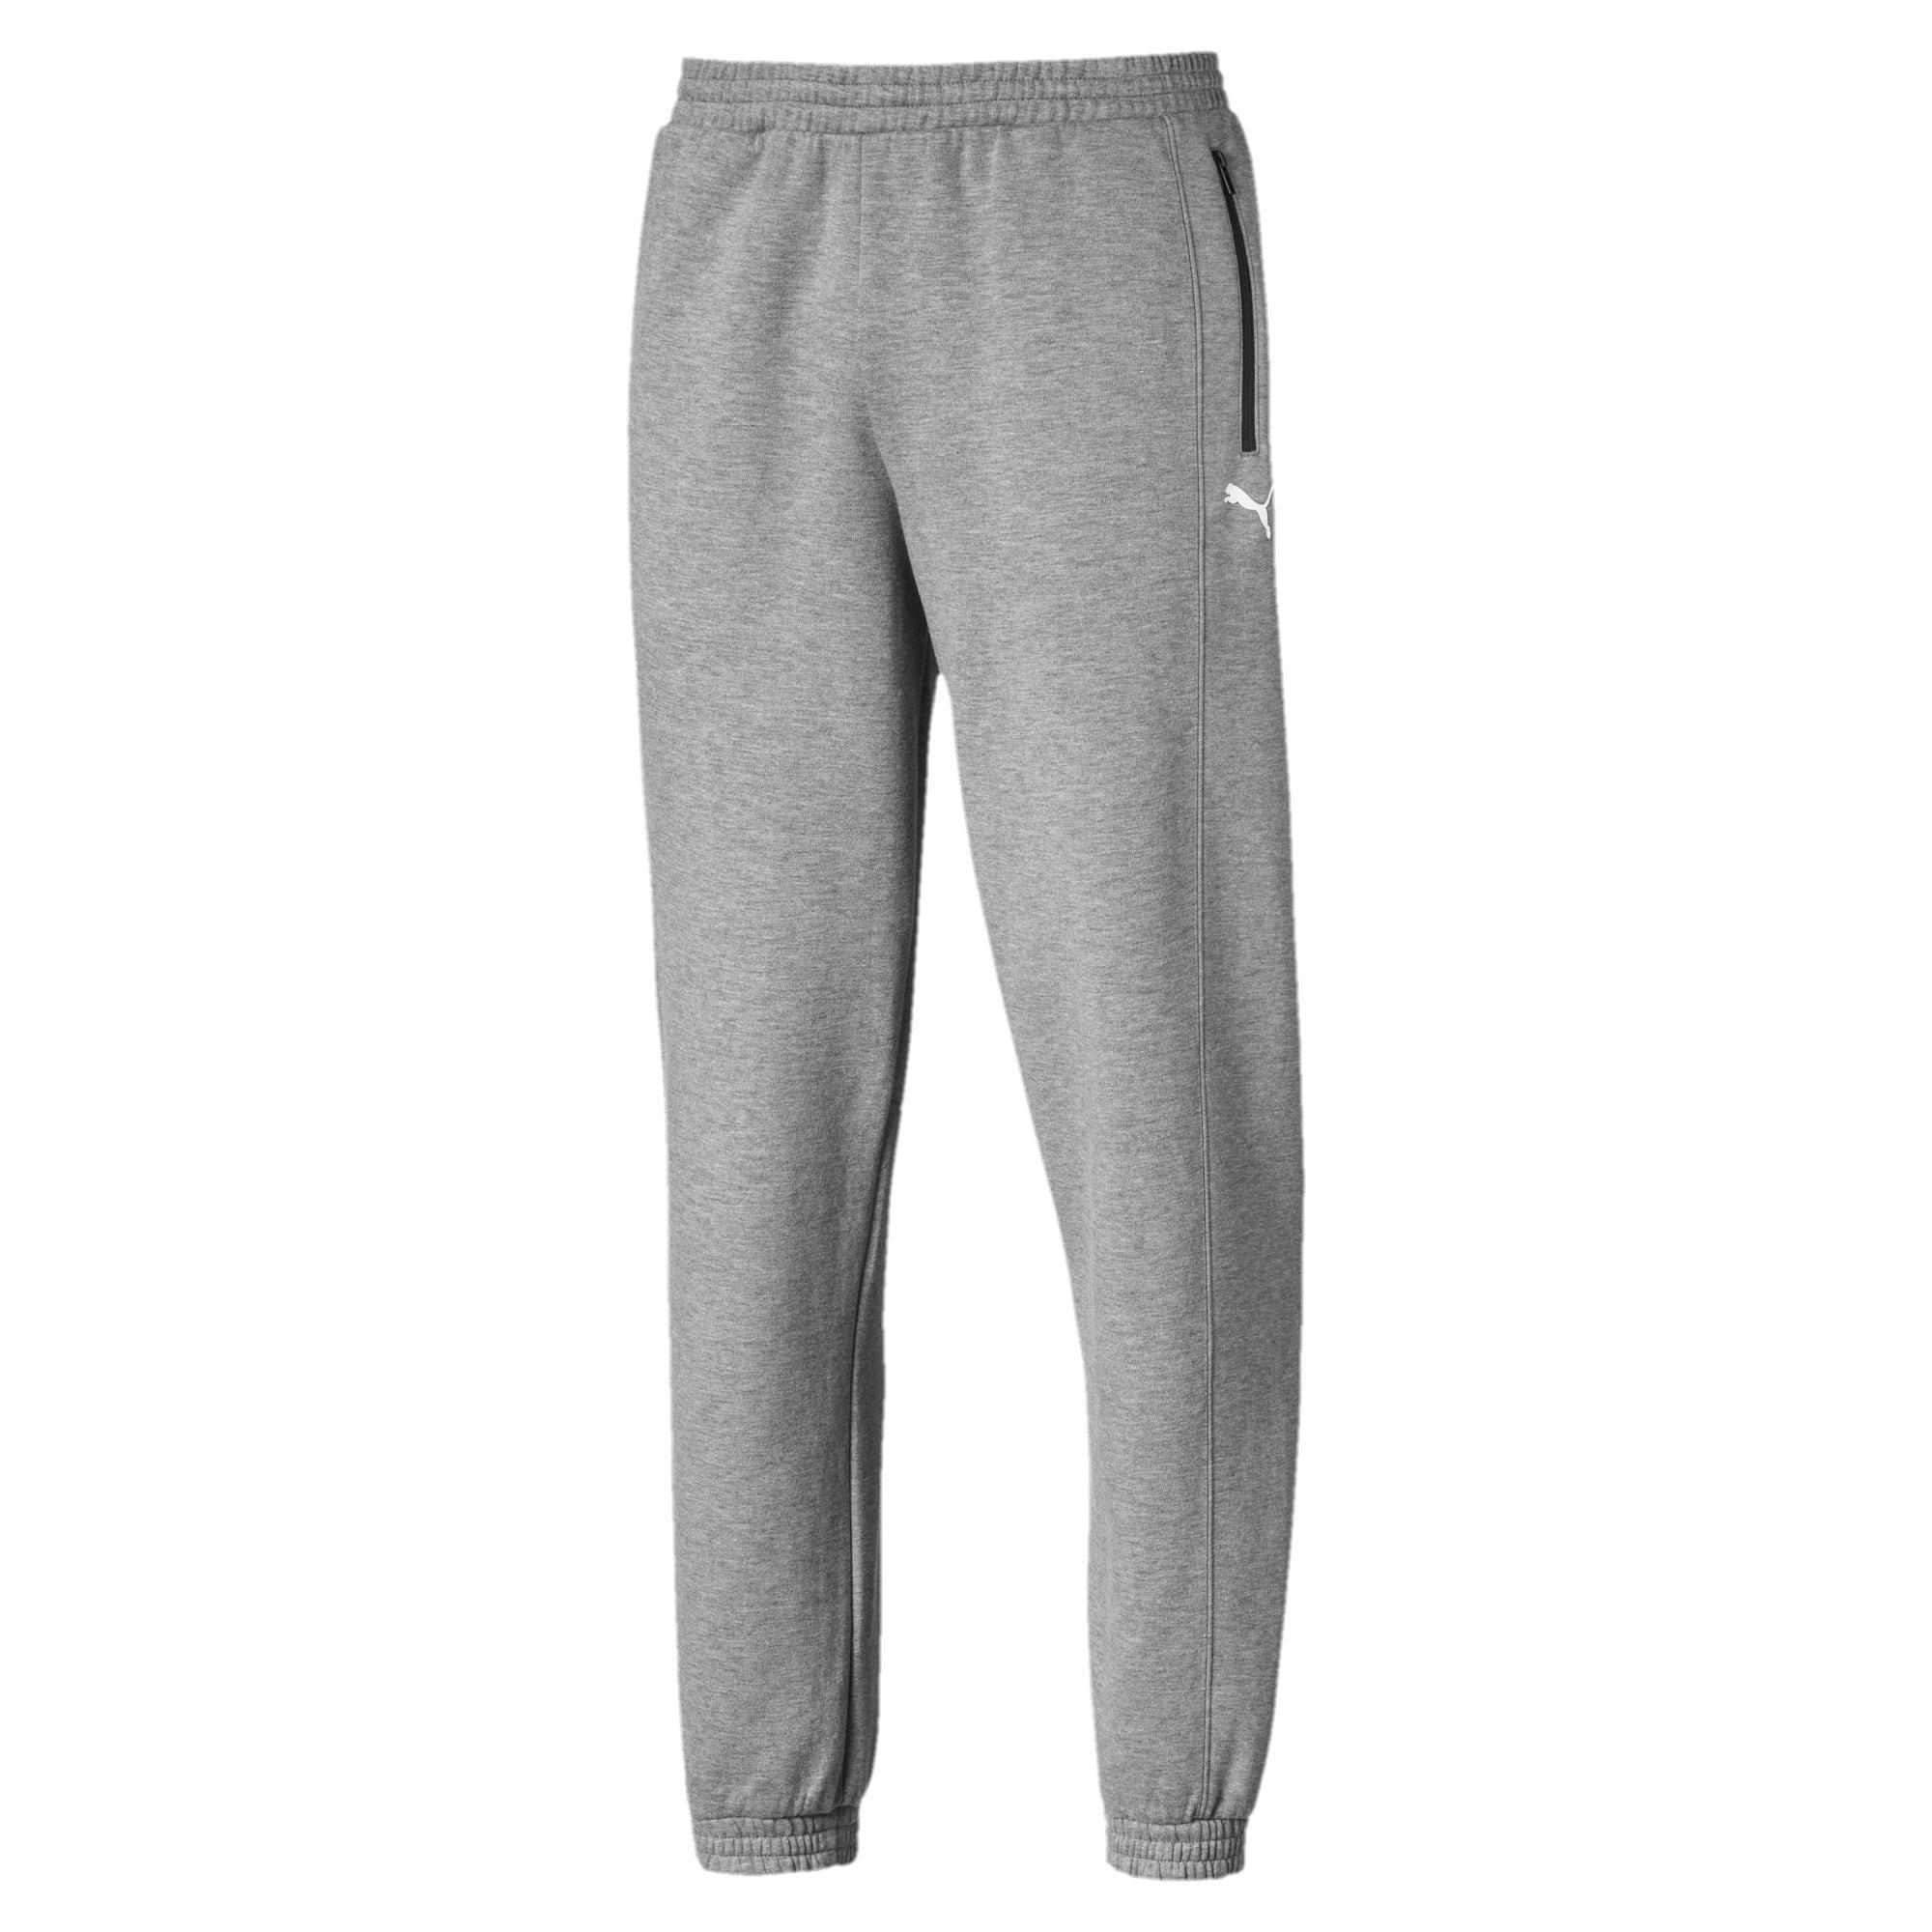 Thumbnail 1 of Scuderia Ferrari Men's Sweatpants, Medium Gray Heather, medium